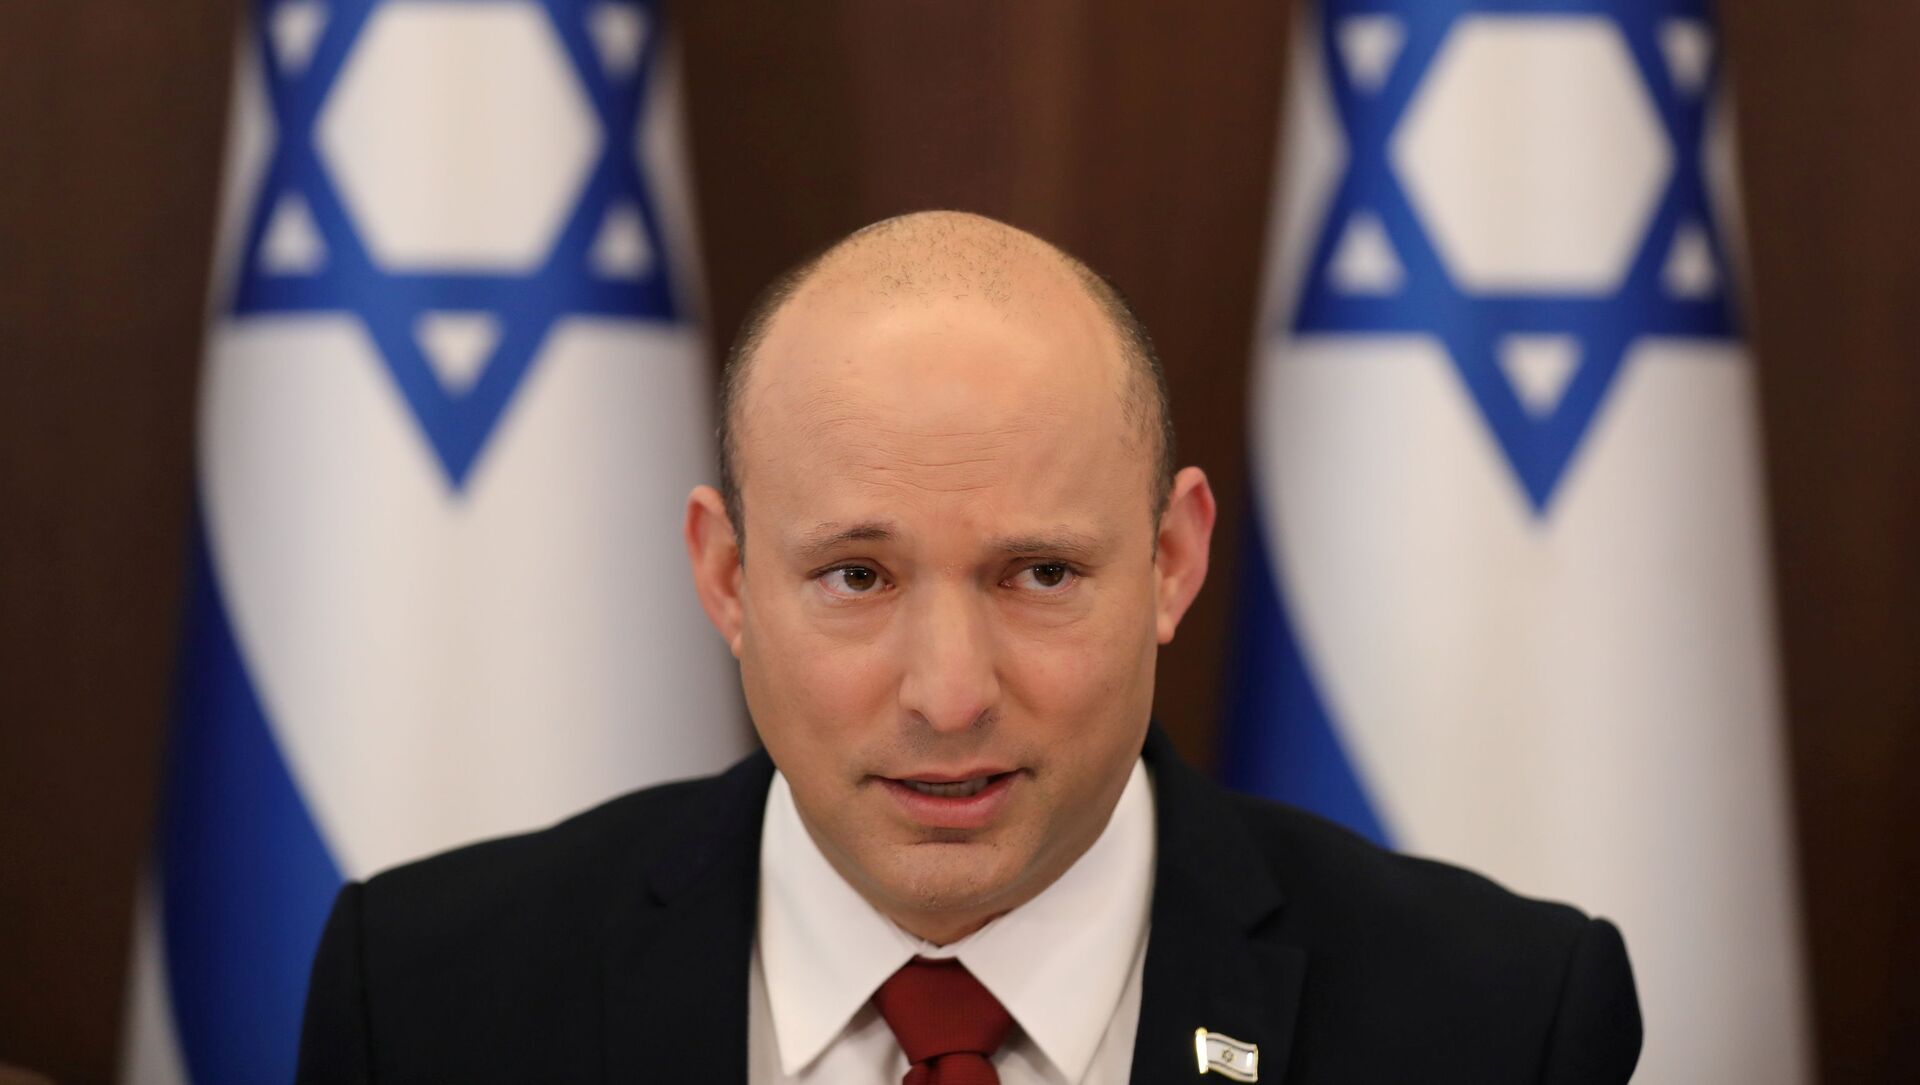 Israeli Prime Minister Naftali Bennett attends the weekly cabinet meeting at the prime minister's office in Jerusalem August 1, 2021. - Sputnik International, 1920, 17.08.2021